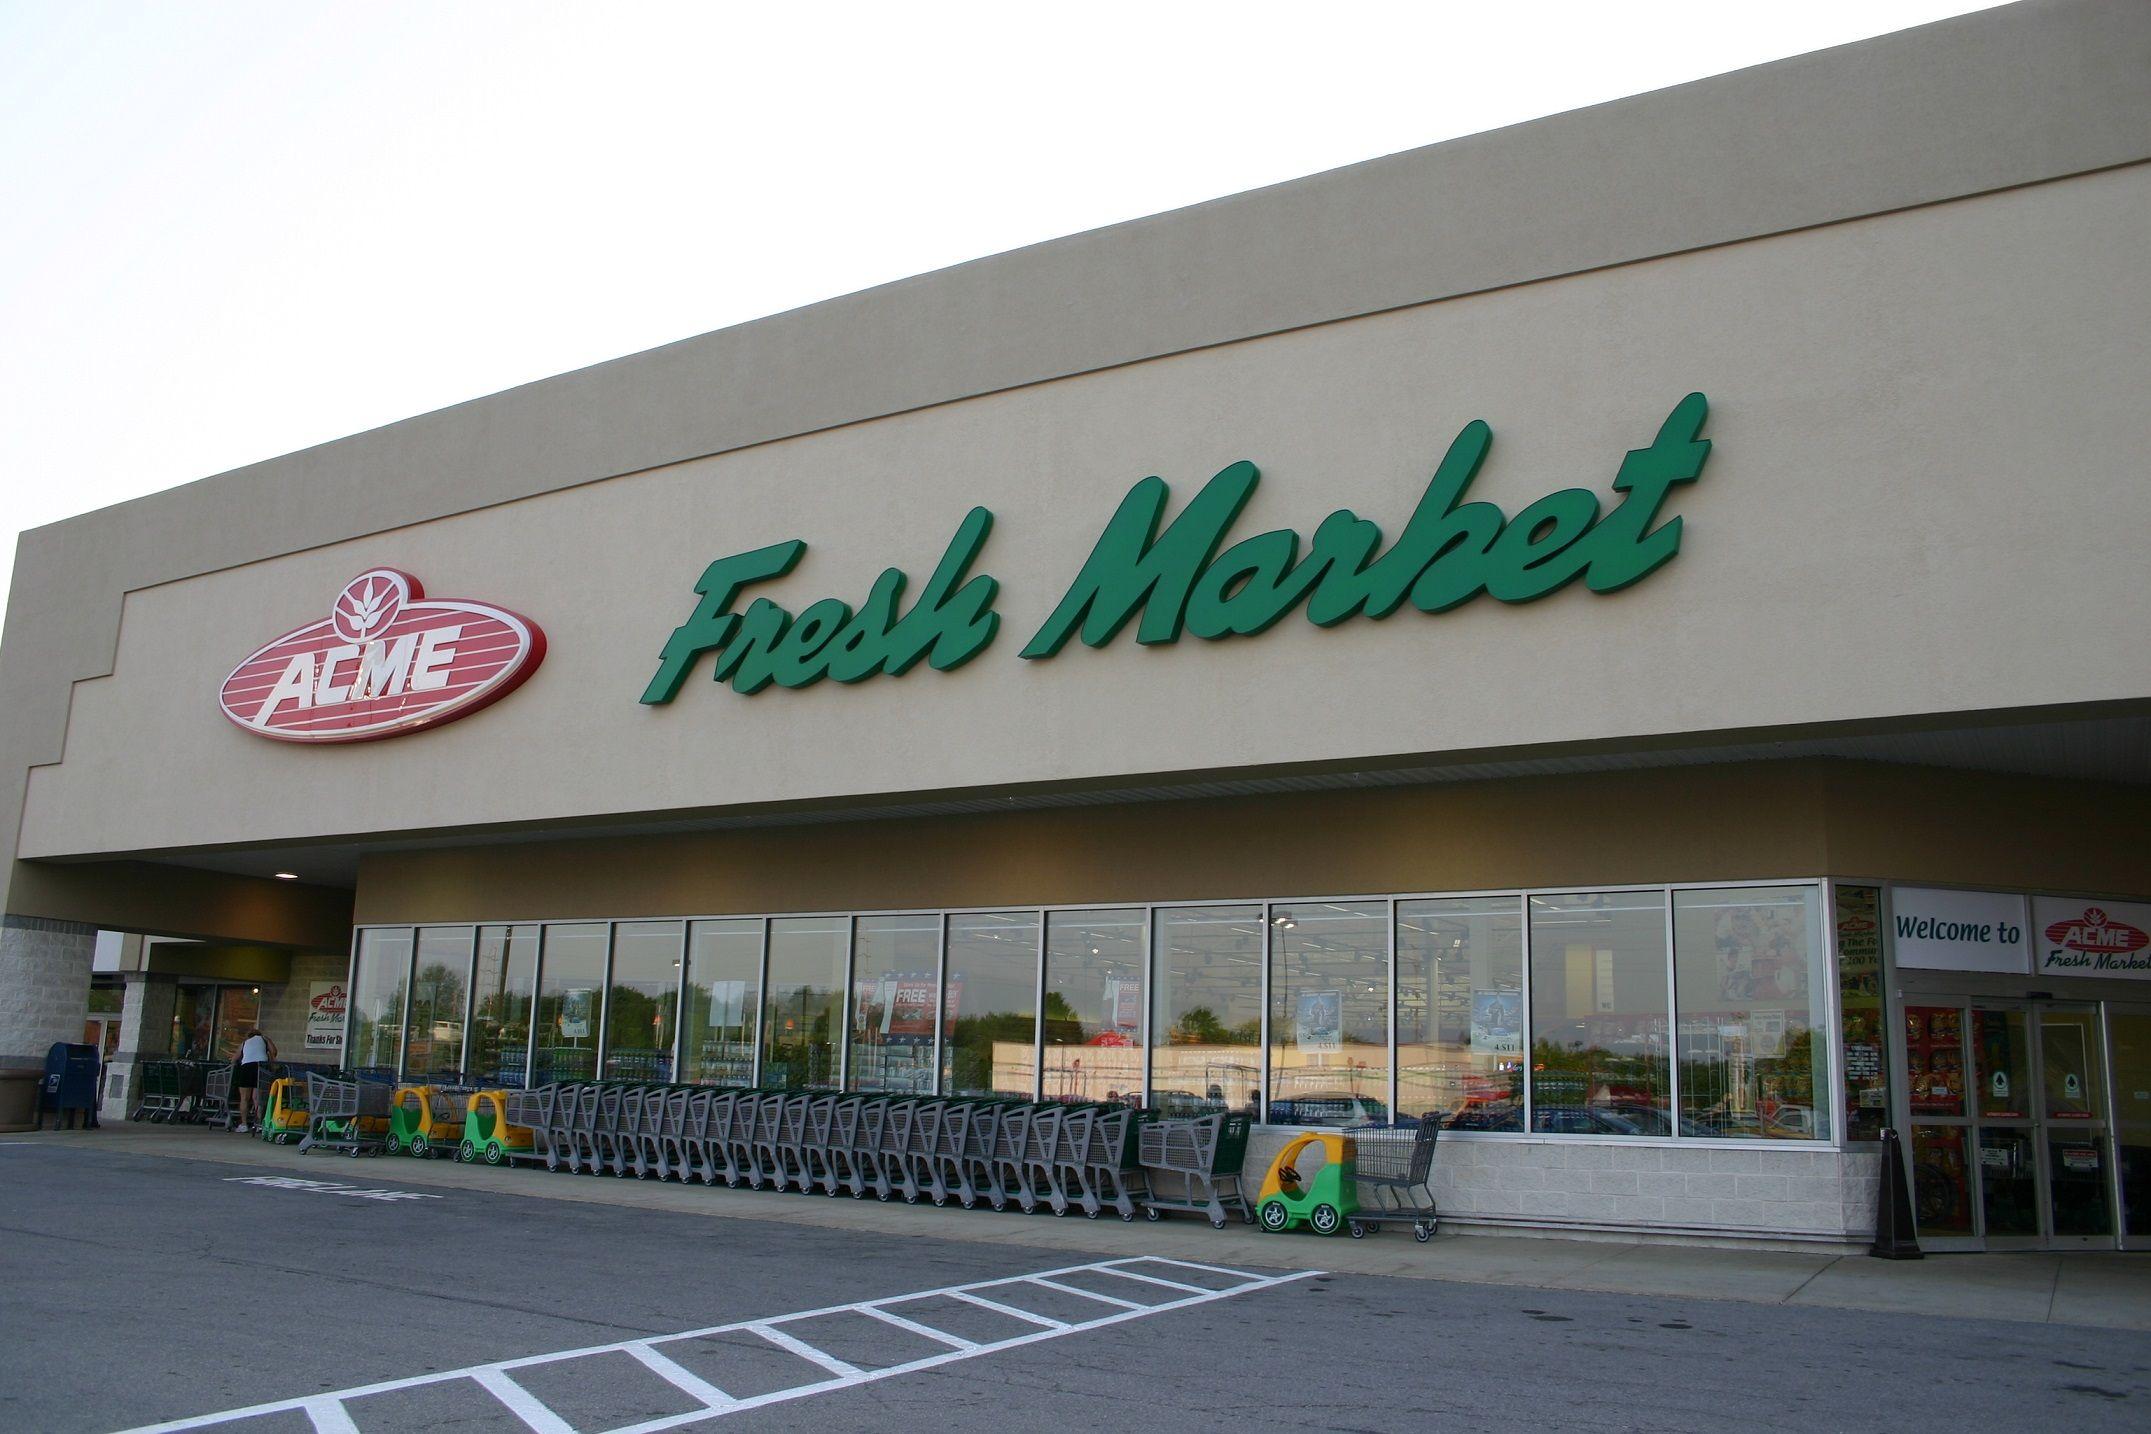 Fresh Market grocery store